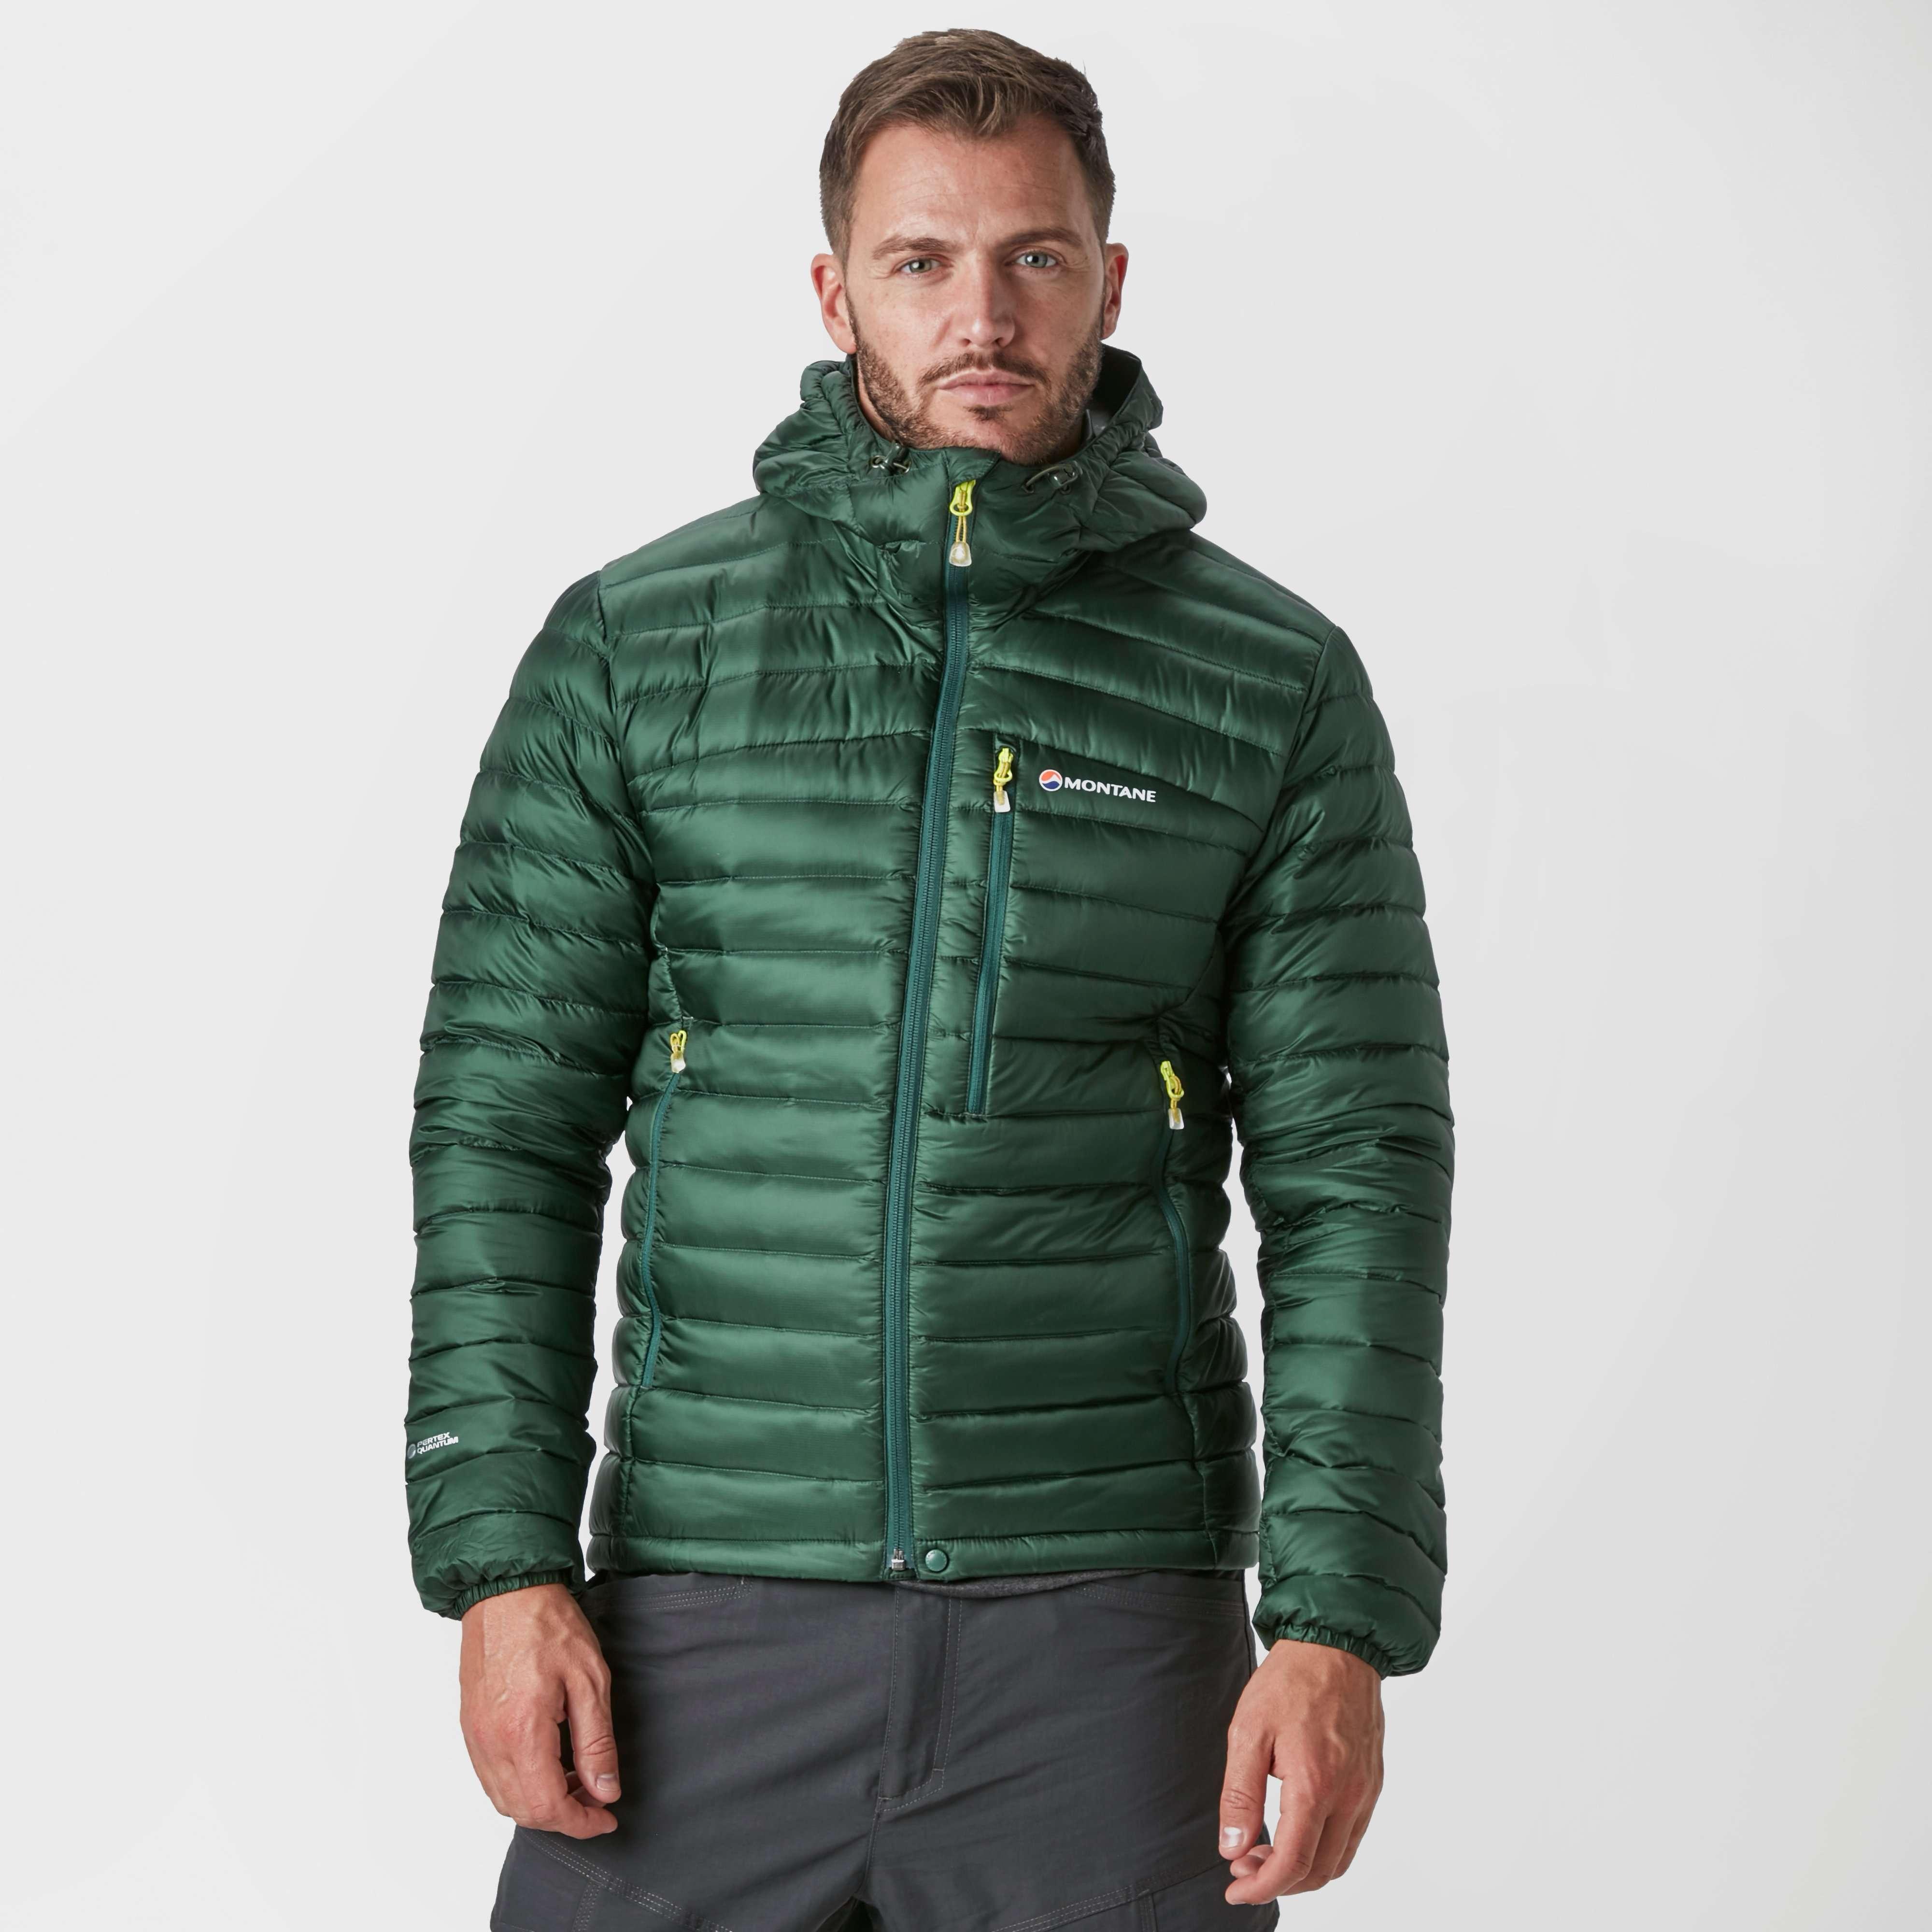 MONTANE Men's Featherlite™ Down Jacket